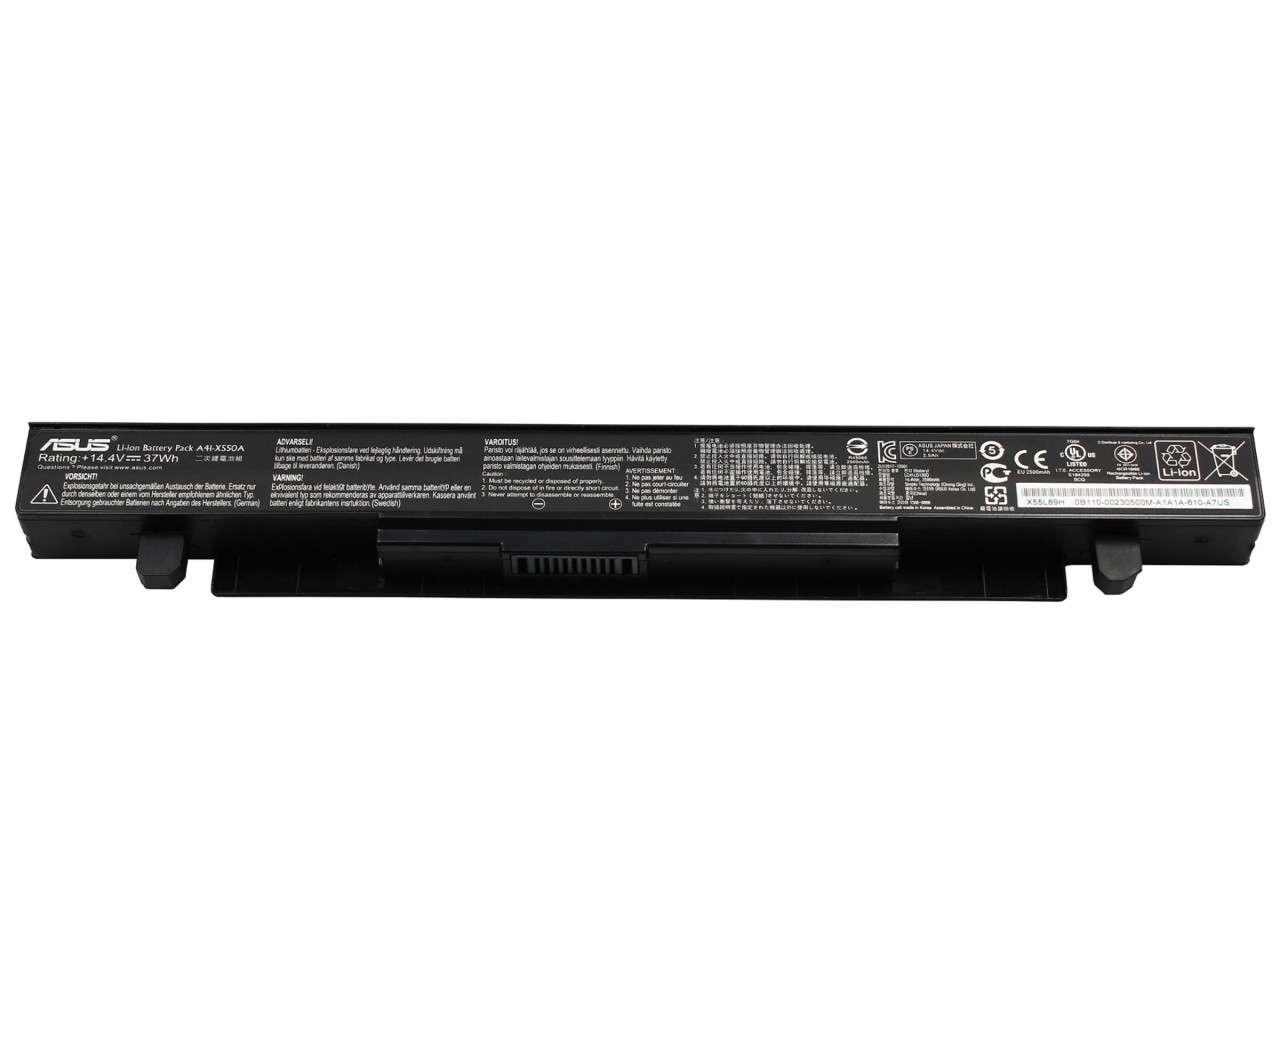 Baterie Asus X550VL Originala imagine powerlaptop.ro 2021